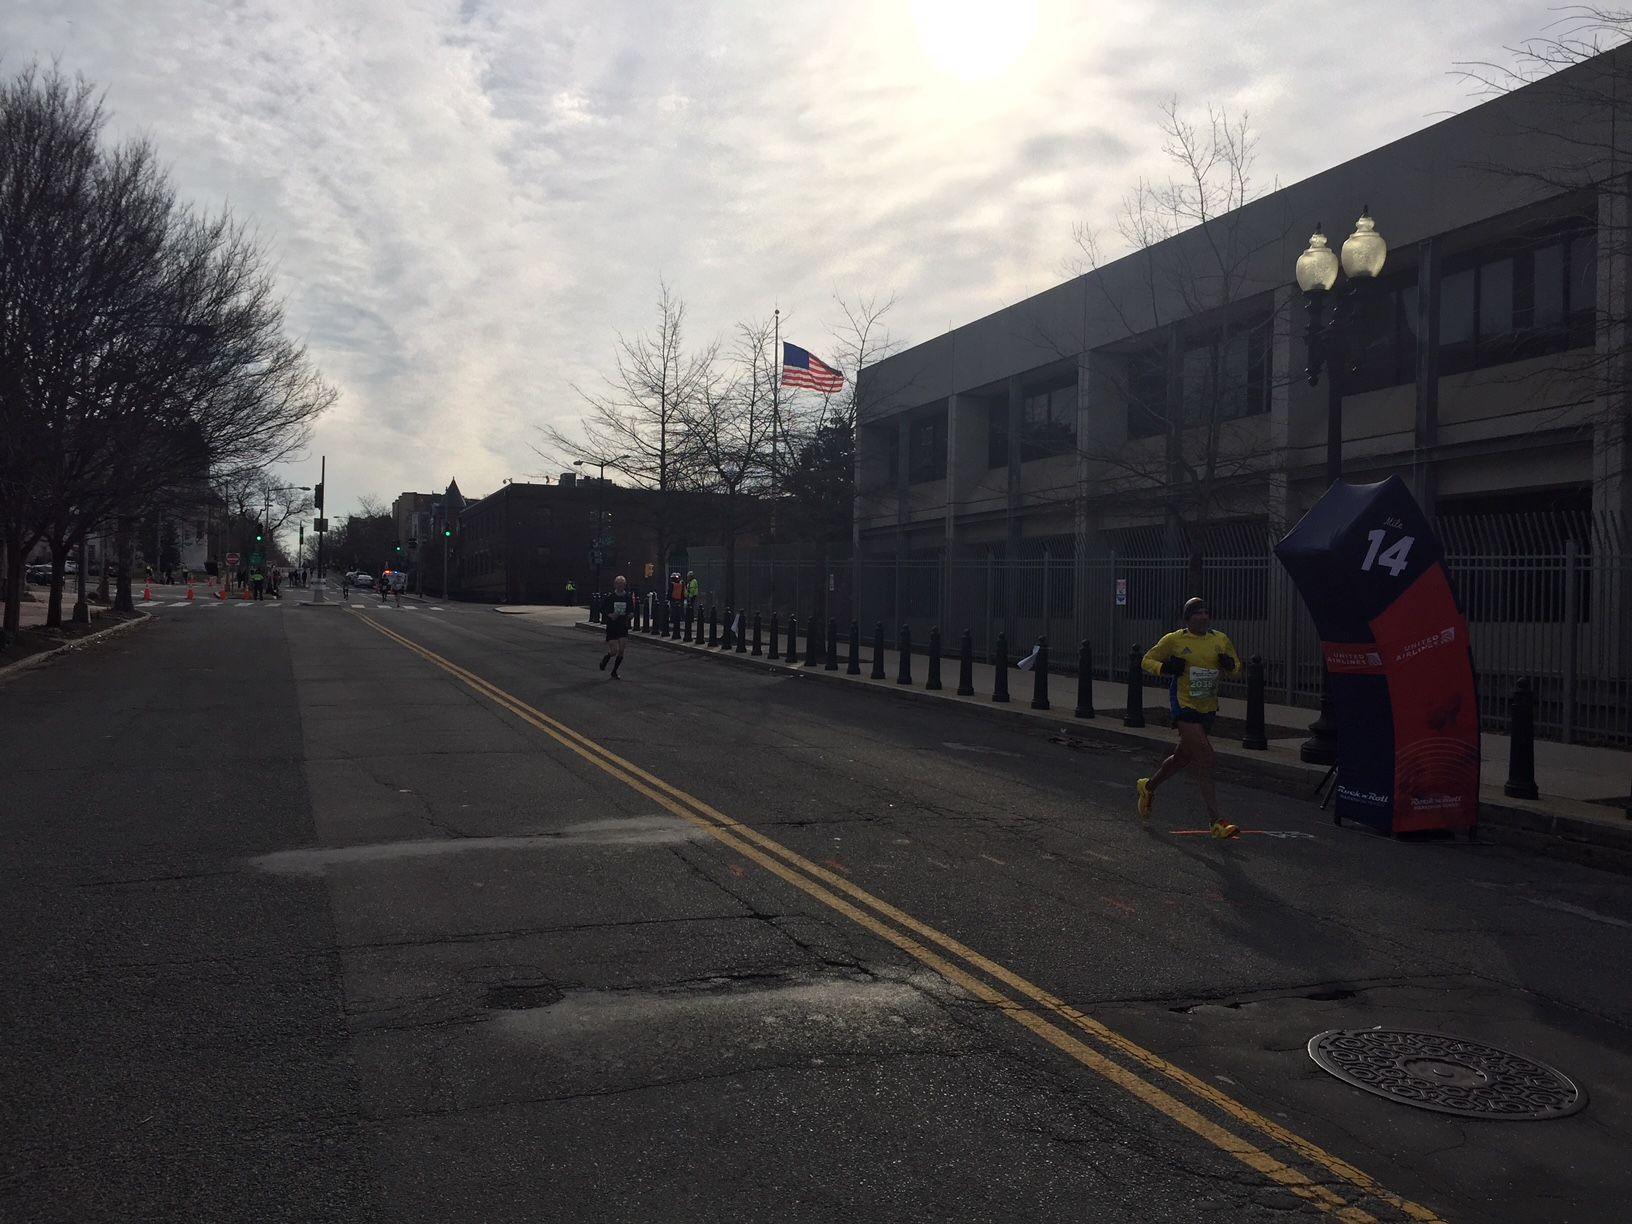 Rock 'n' Roll Marathon runners race down the street in Washington. (WTOP/John Domen)